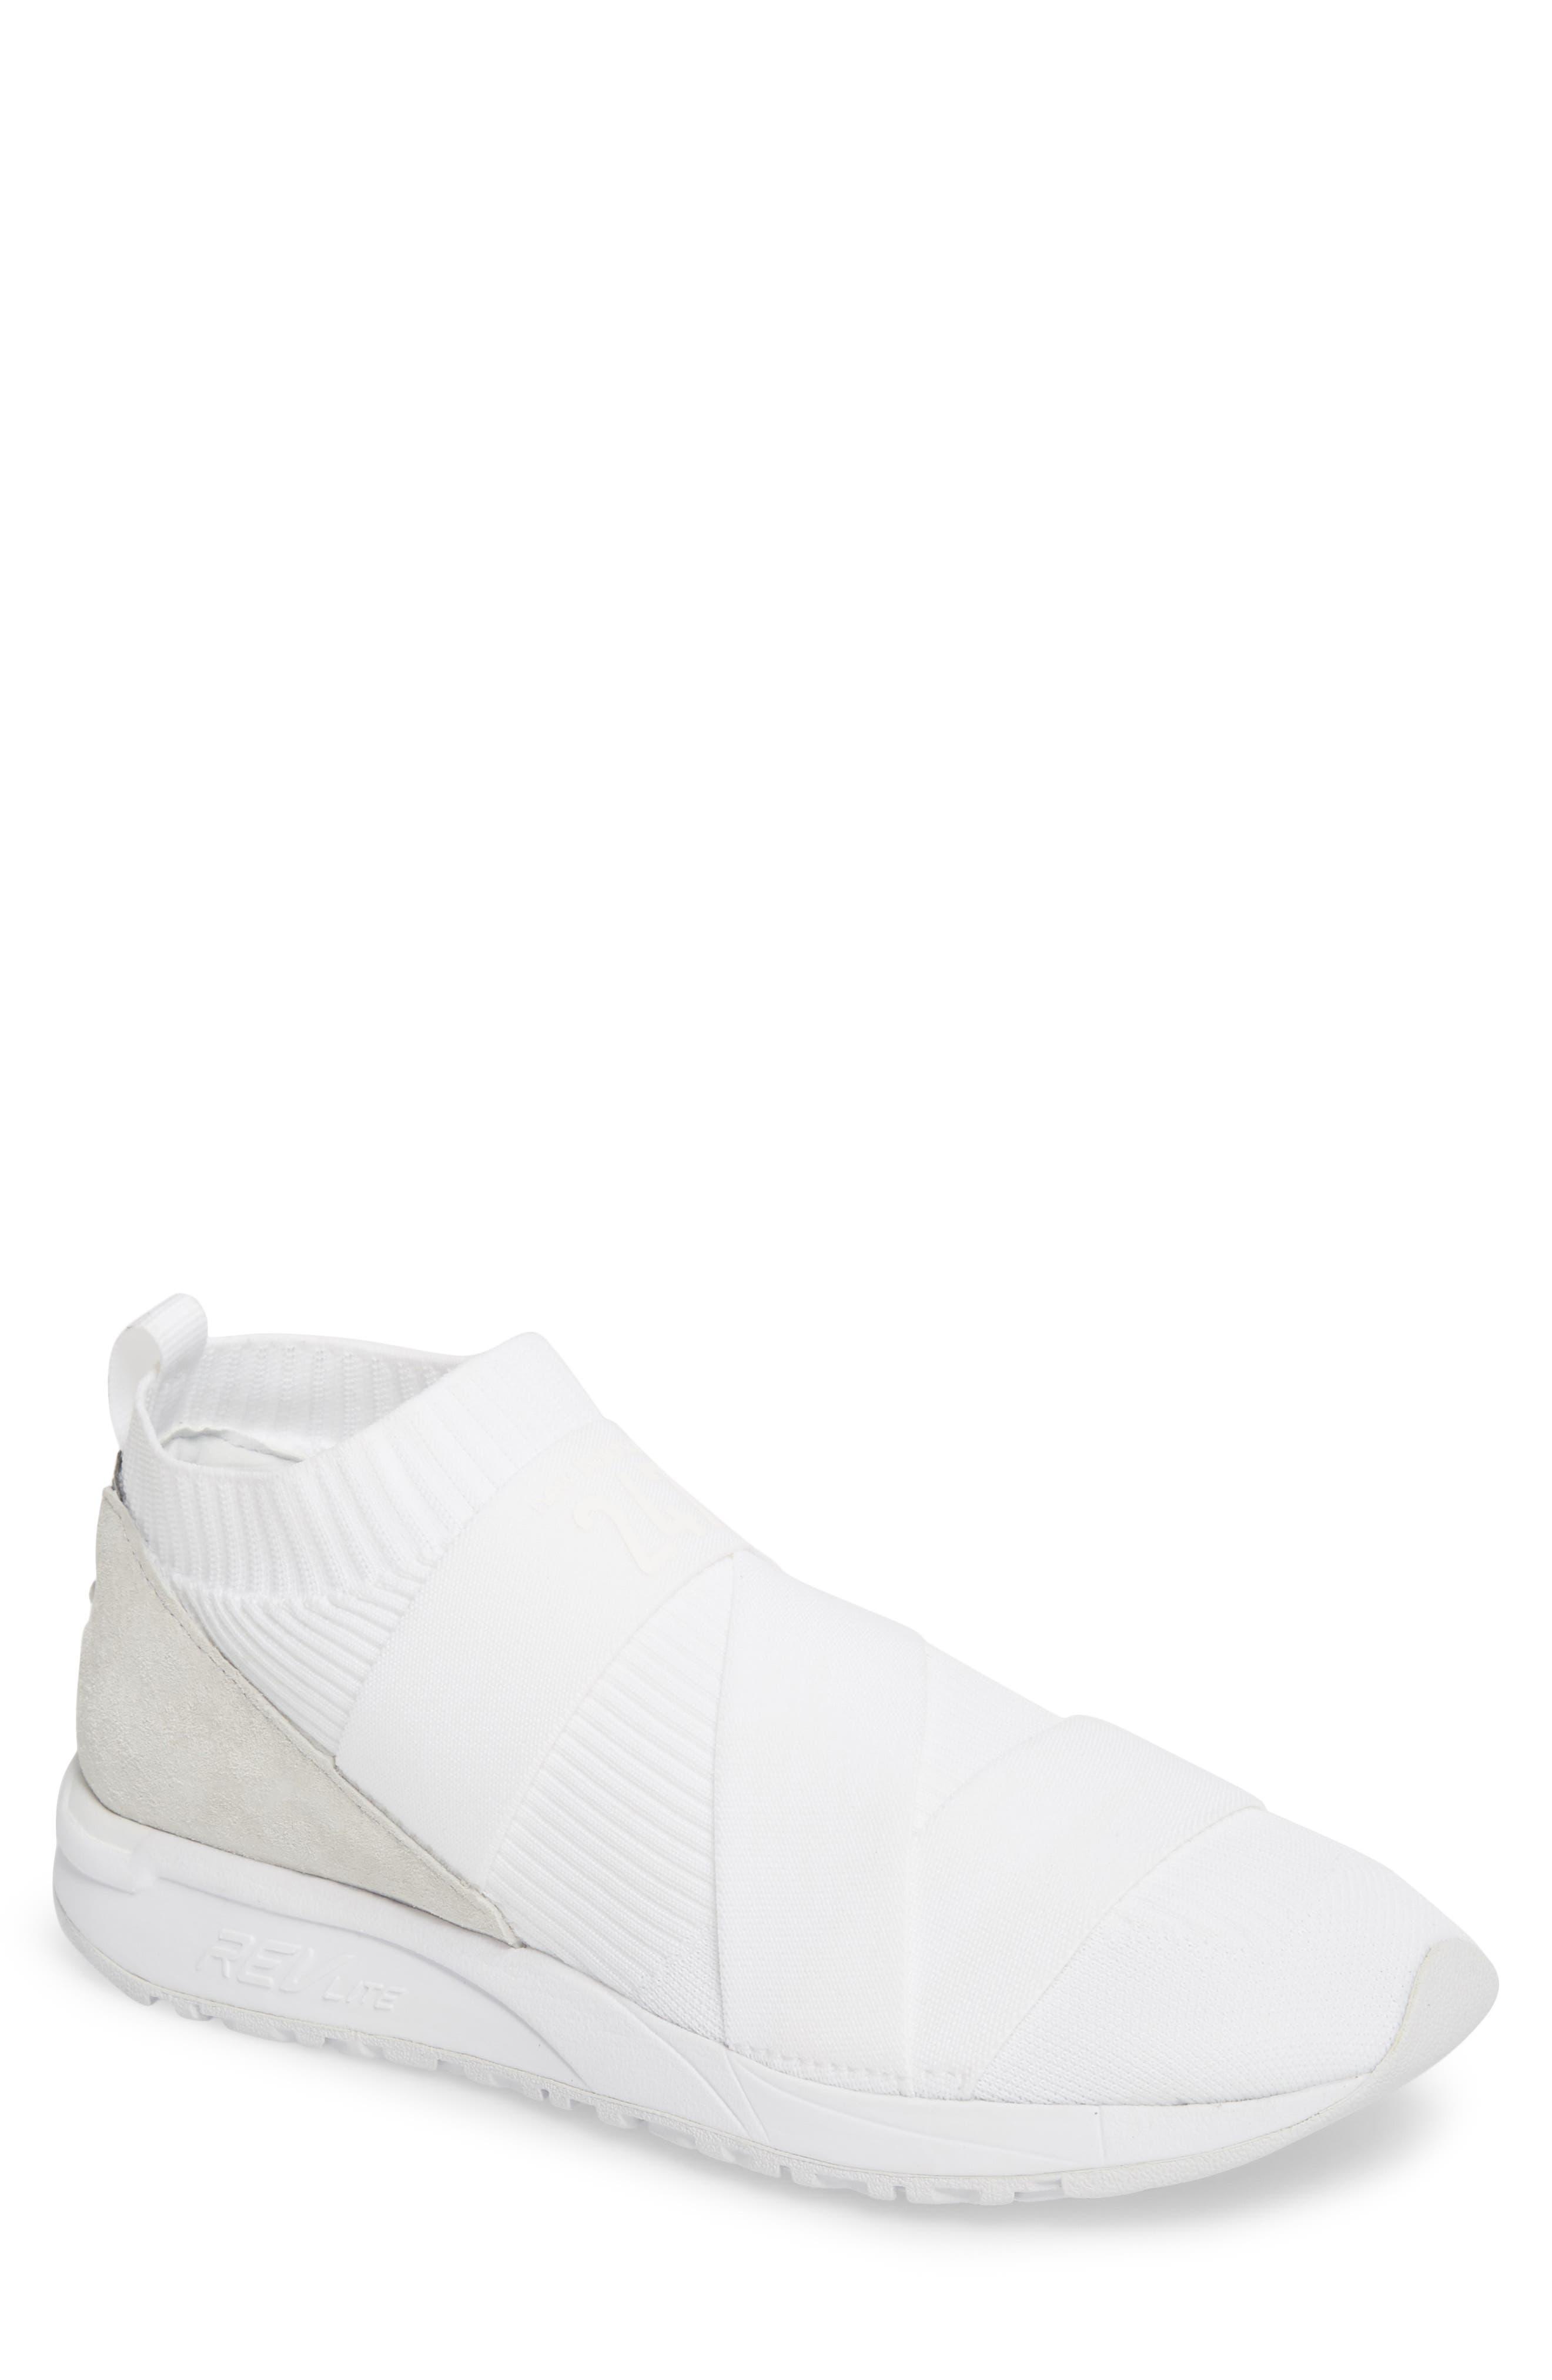 247 Knit Sneaker,                             Main thumbnail 1, color,                             WHITE